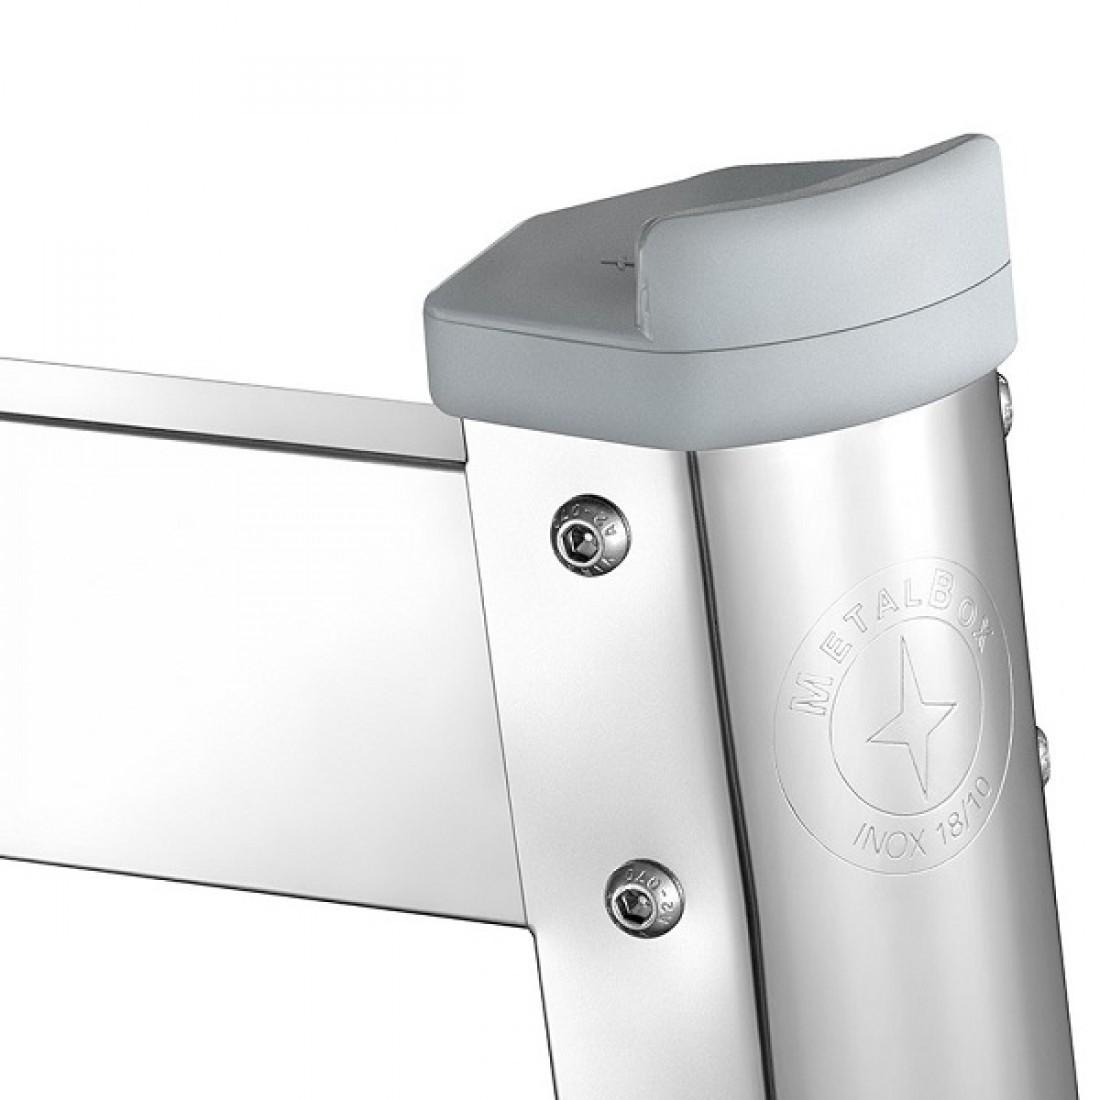 Trepied inox cu protectii din plastic MetalBox SB-46, 460 mm